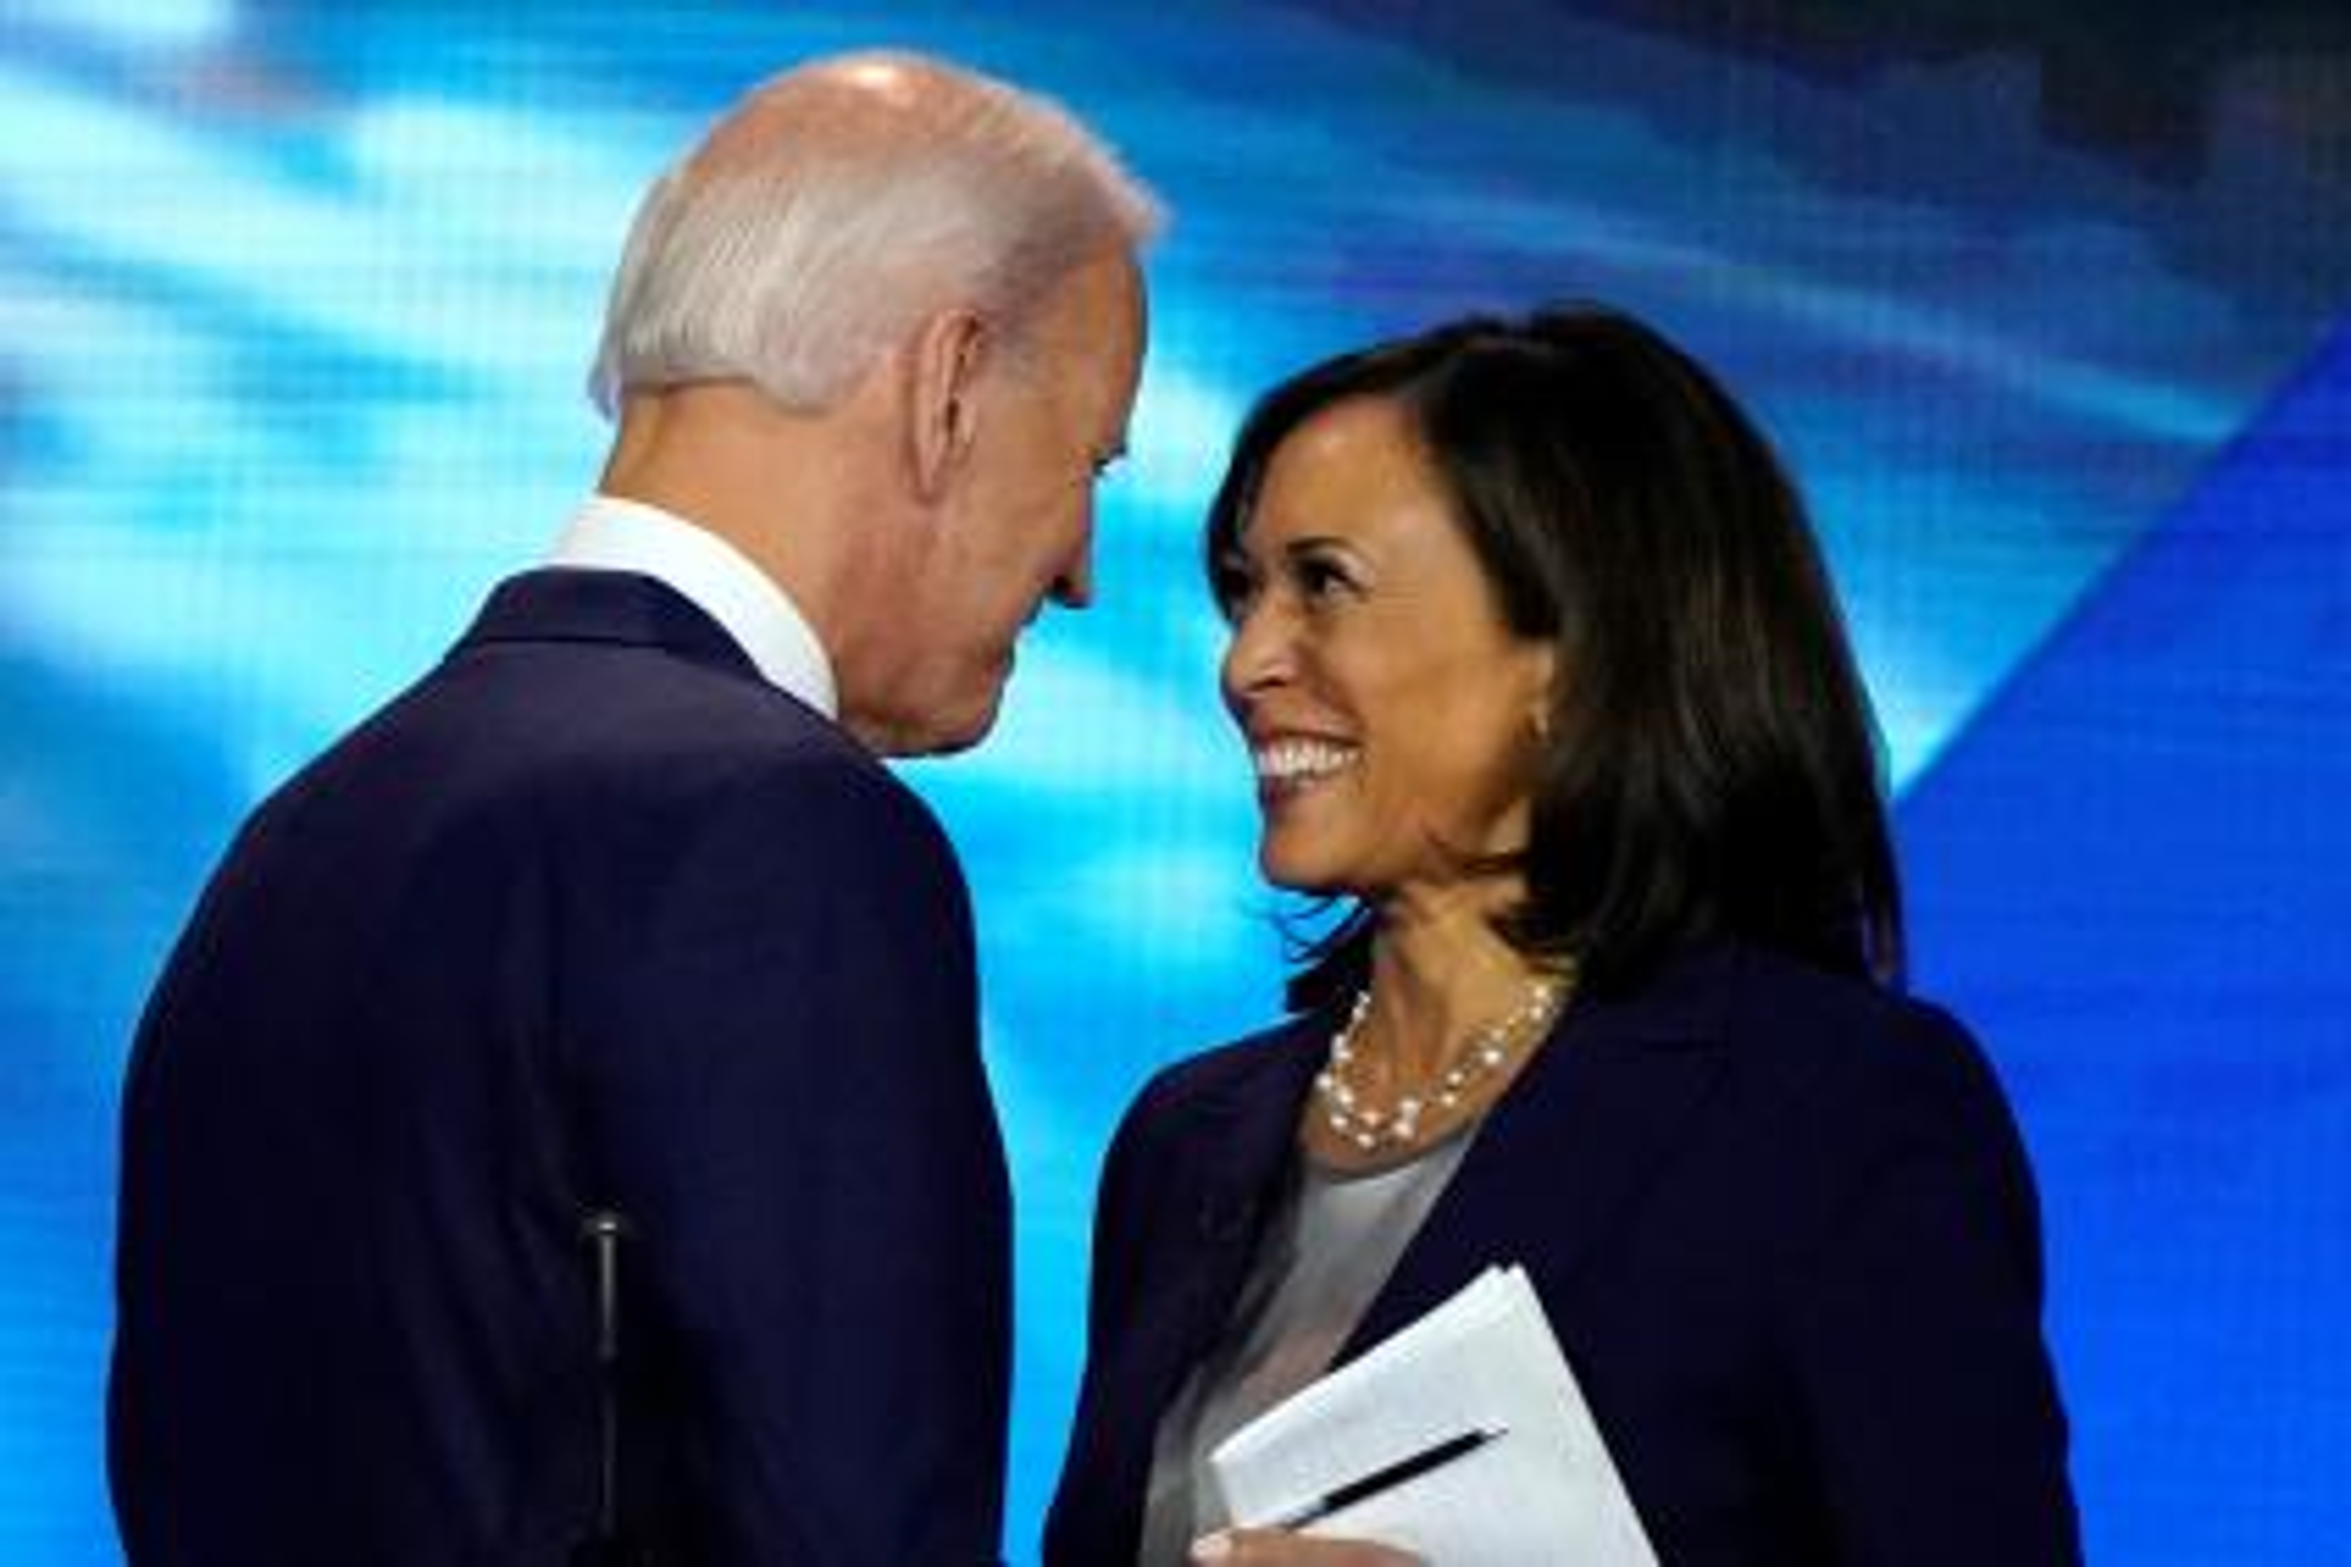 Former Vice President Joe Biden talks with Senator Kamala Harris after the conclusion of the 2020 Democratic U.S. presidential debate in Houston, Texas, U.S., September 12, 2019.